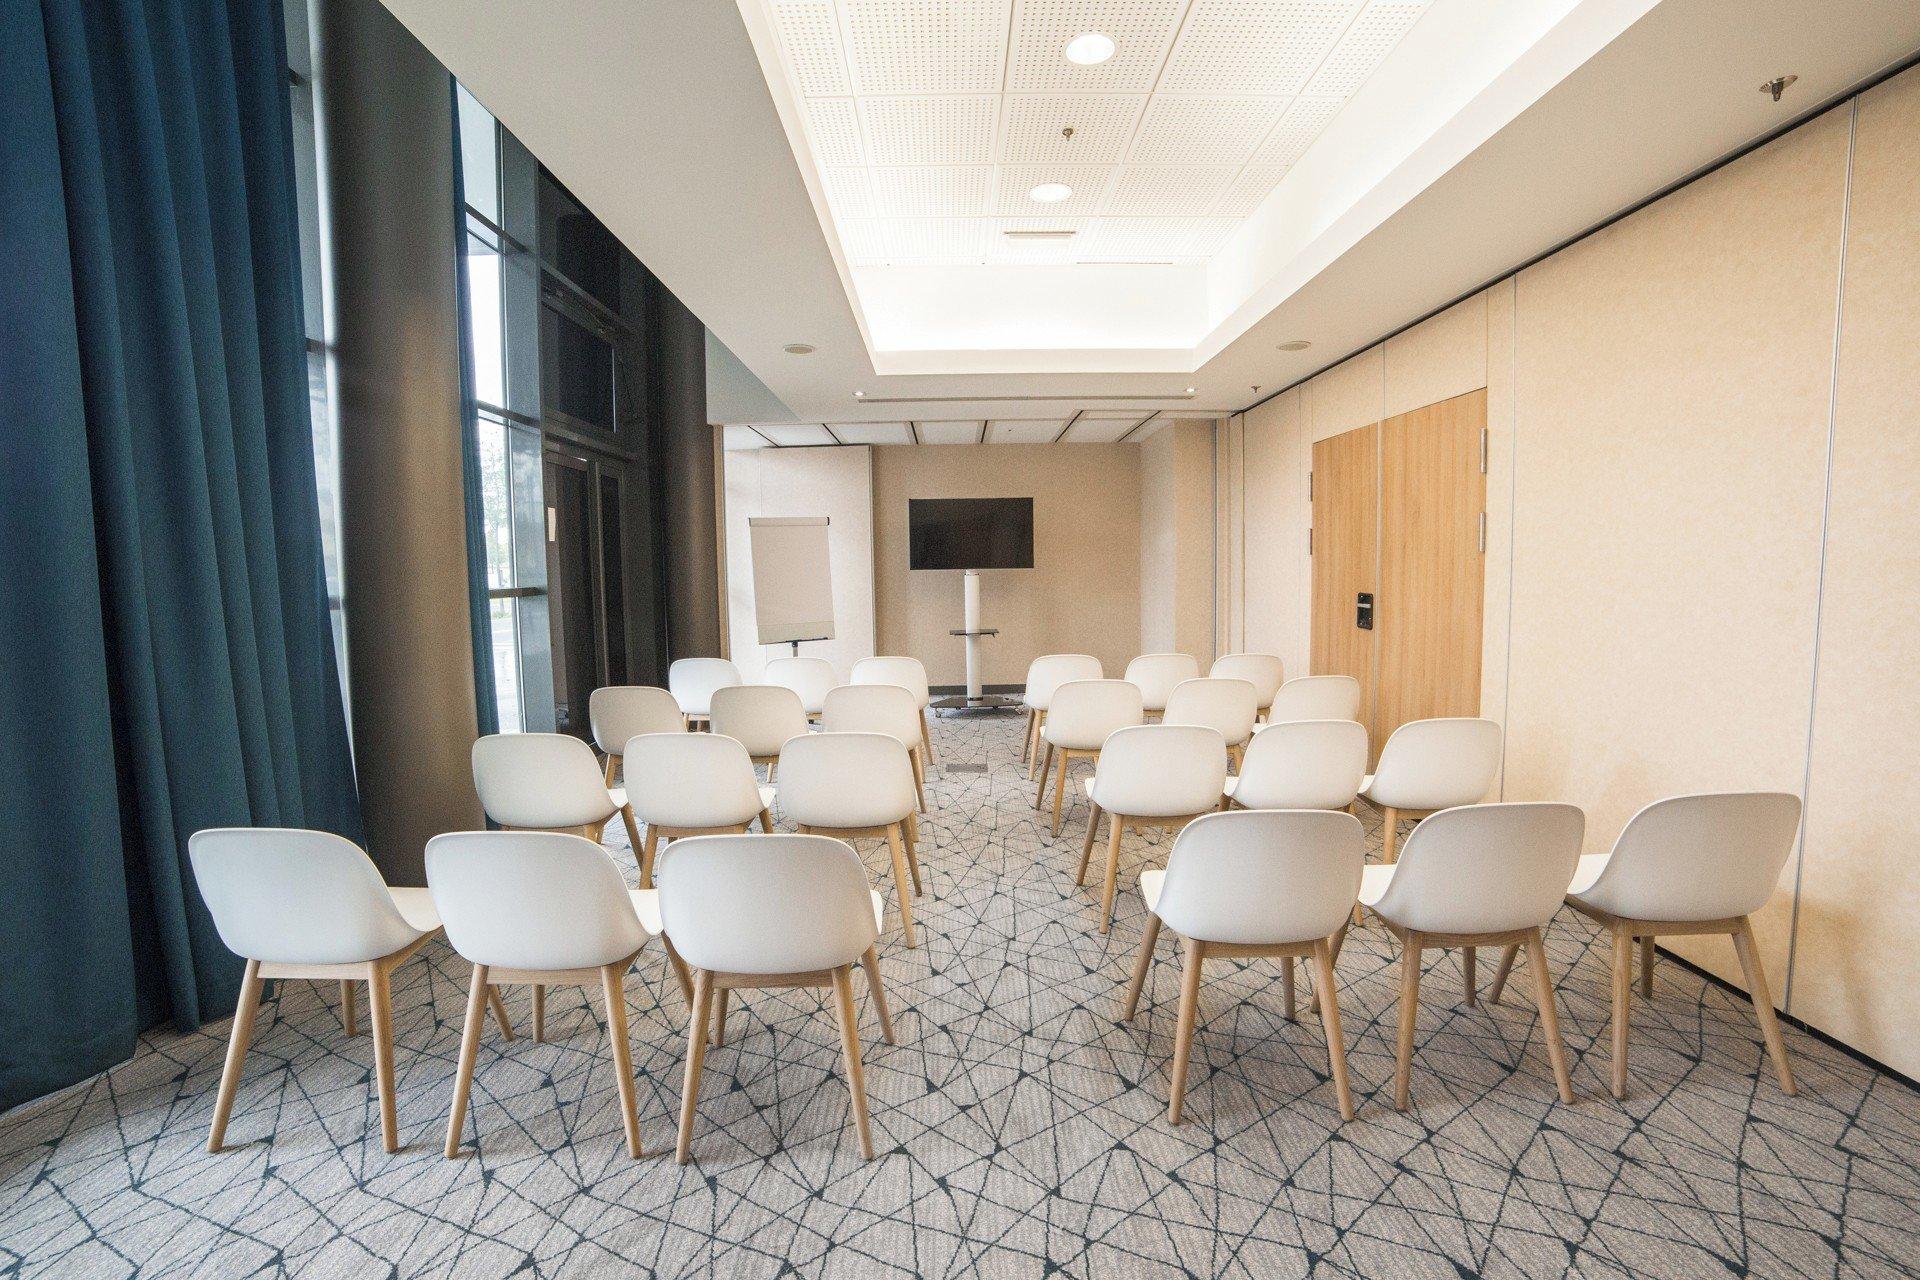 Paris training rooms Meetingraum Courtyard by Marriott Paris Defense West - Colombes image 0